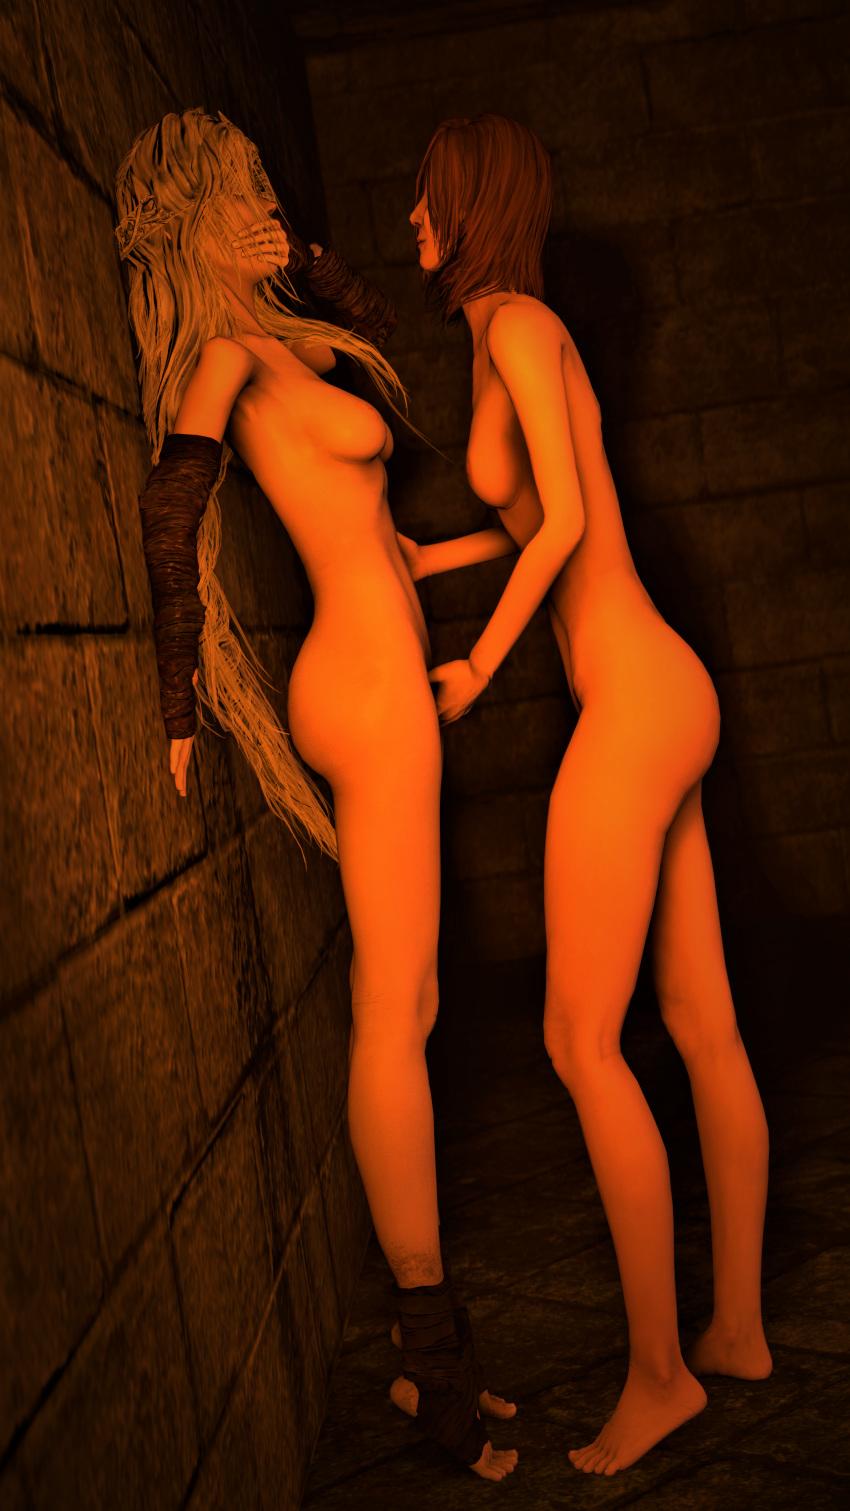 dark list souls snuggly 3 Game of thrones 3d porn